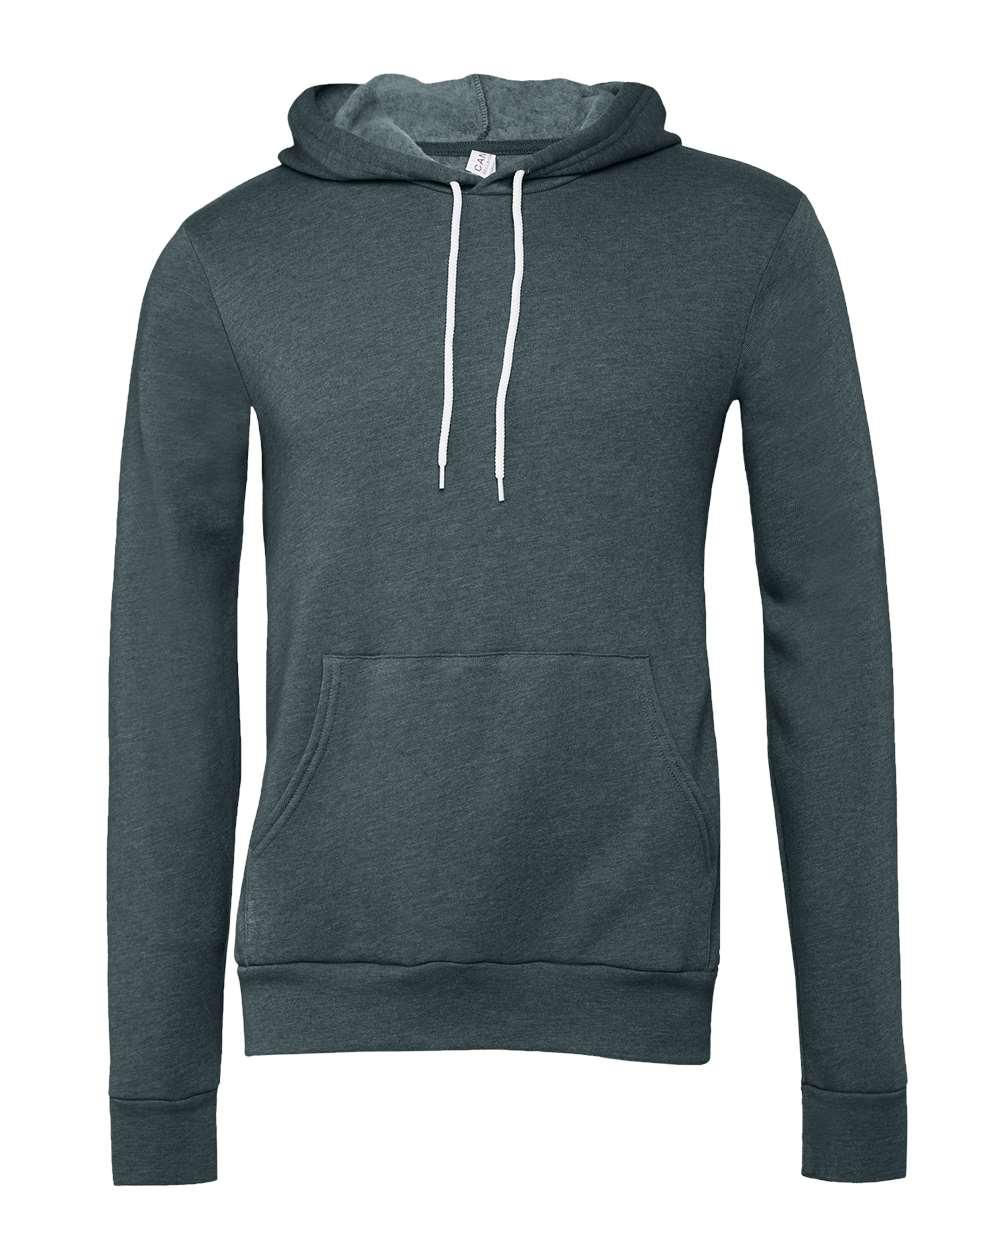 Bella-Canvas-Unisex-Sponge-Hooded-Pullover-Sweatshirt-Blank-3719-up-to-2XL thumbnail 60